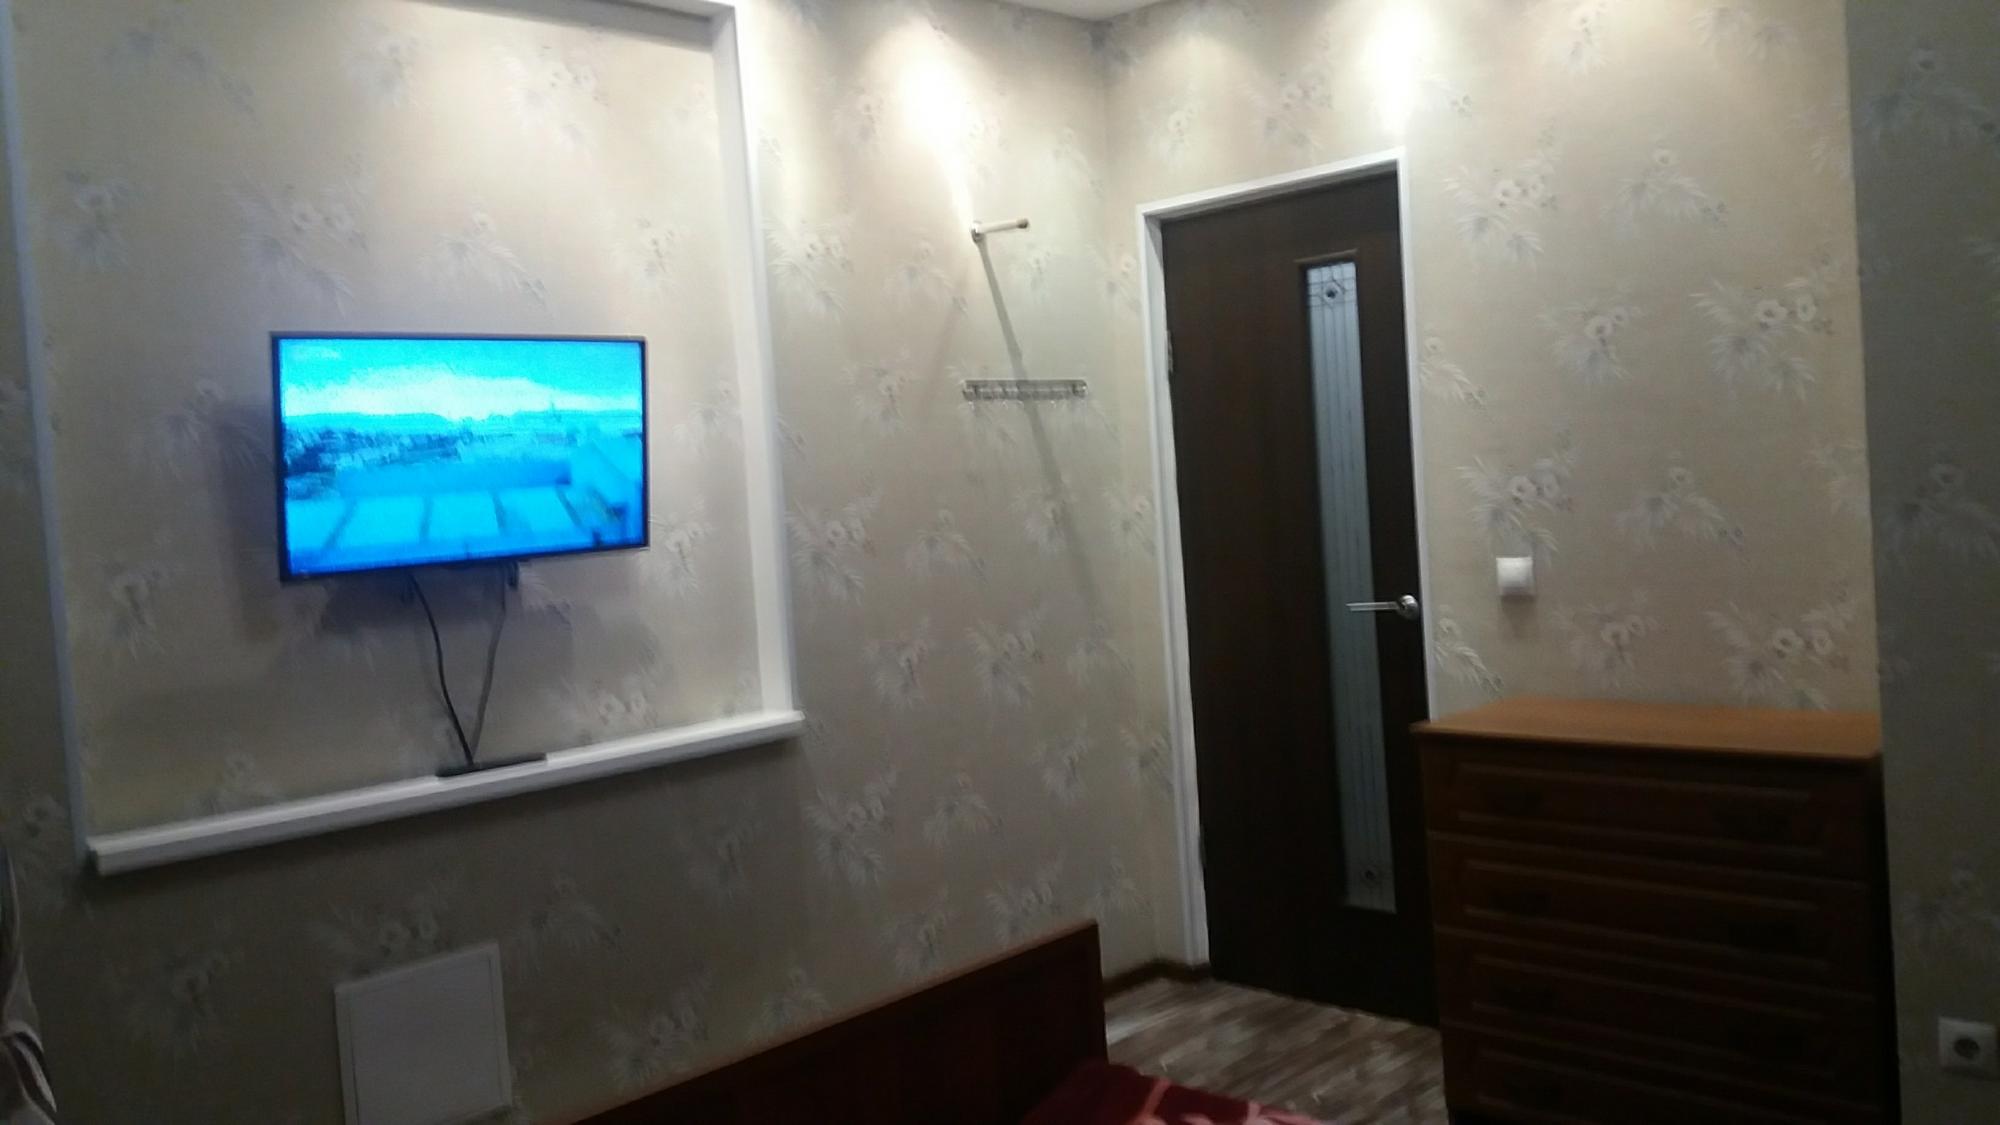 Квартира, 1 комната, 42 м² в Домодедово 89057005352 купить 1